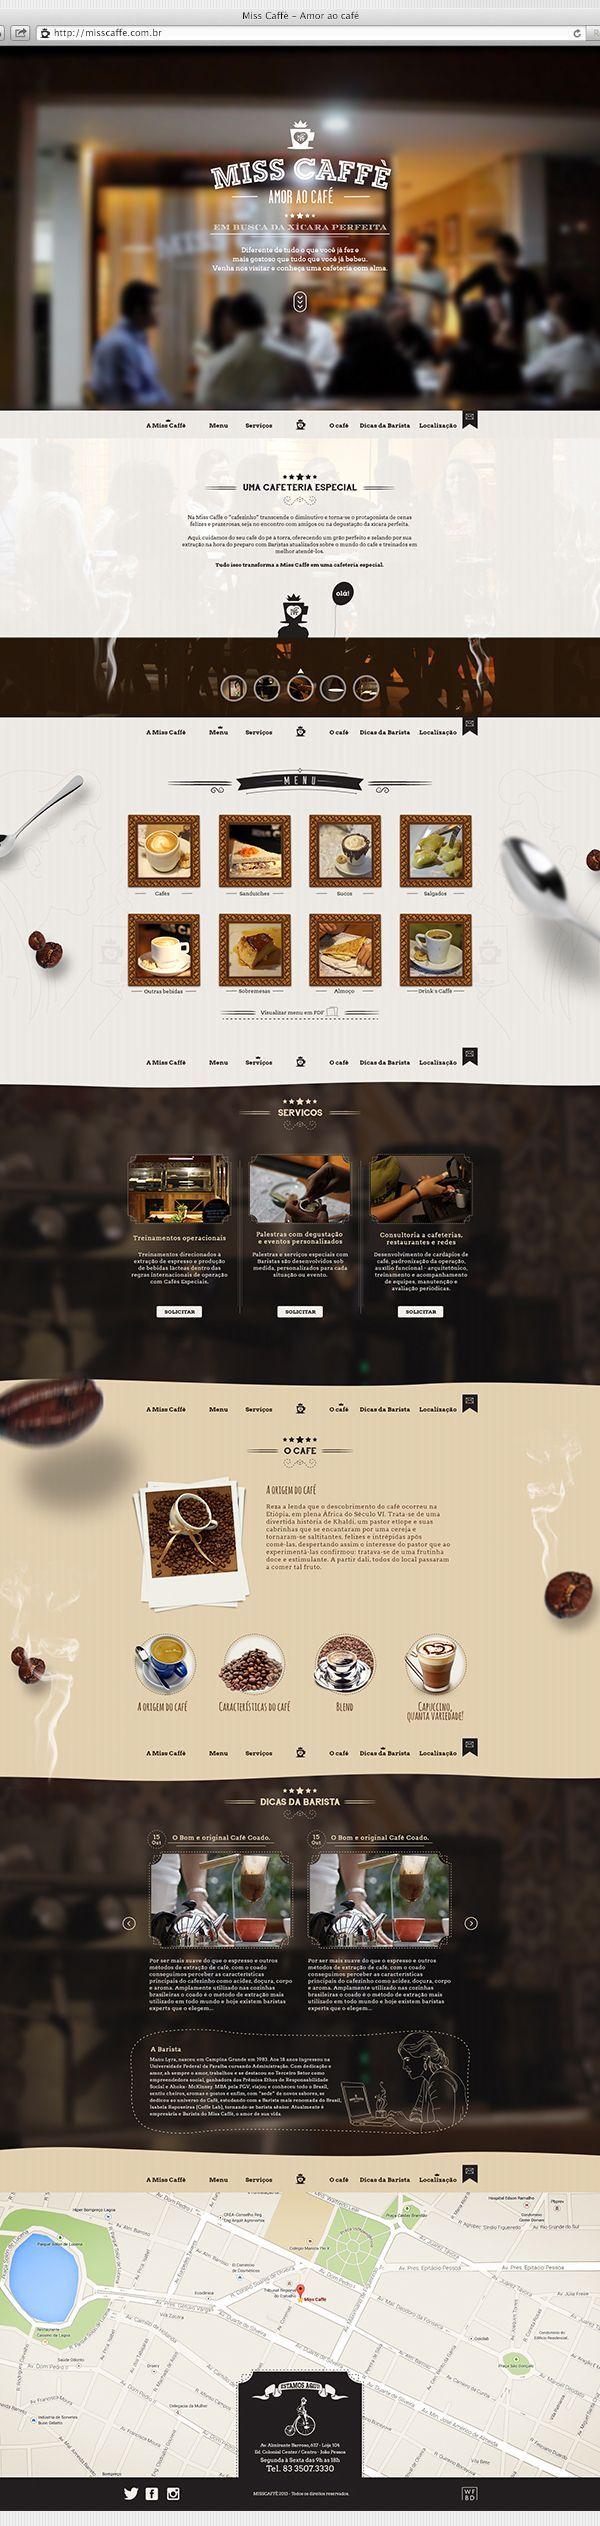 Website for cafeteria in João Pessoa / Paraíba / Brazil.#webdesign #color #photography #typography #ResponsiveDesign #Web #UI #UX #WordPress #Resposive Design #Website #Graphics